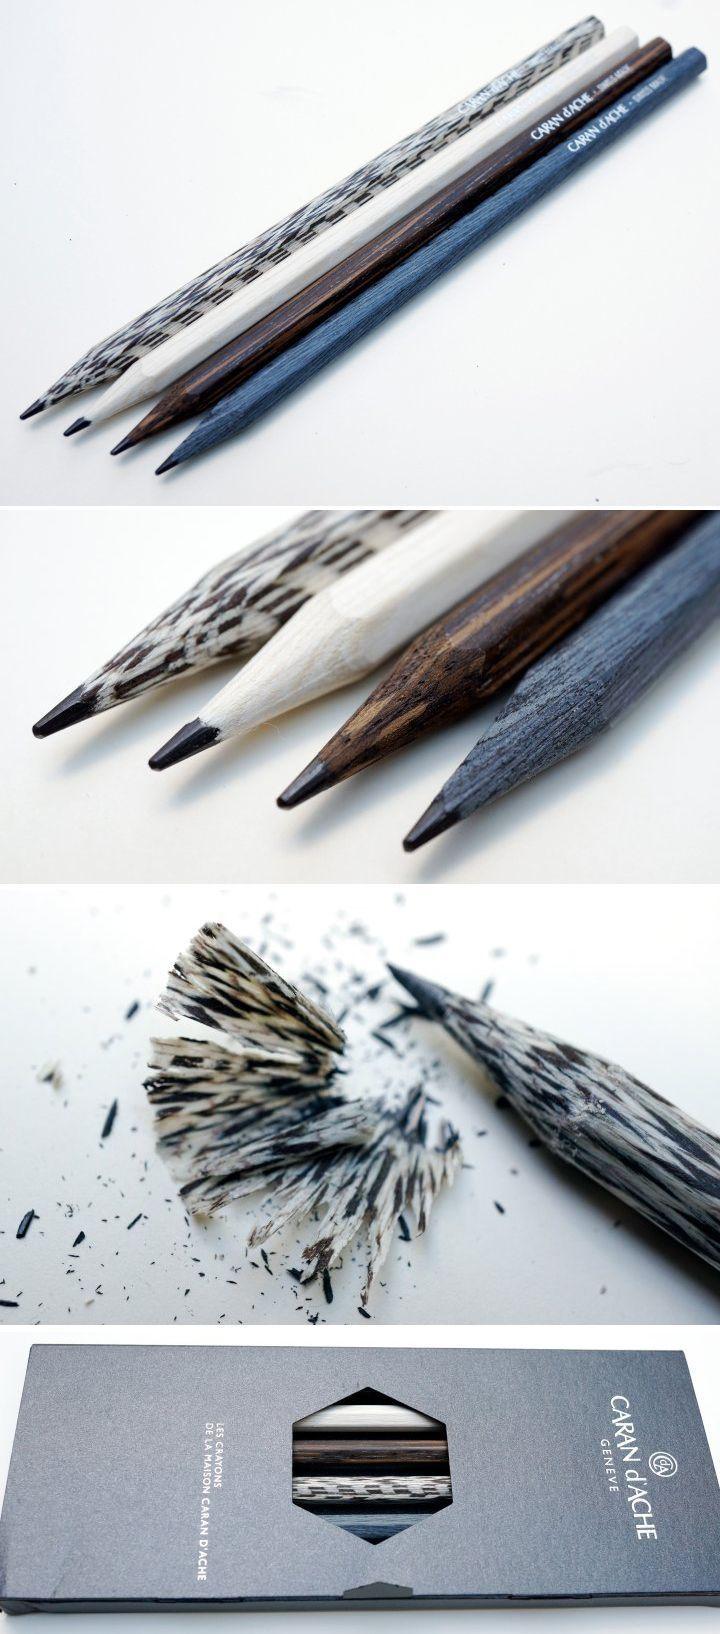 pencils made from Titanium Oak, Macassar Ebony, Lati Gray, and American Walnut made by Les crayons de la maison Caran d'Ache